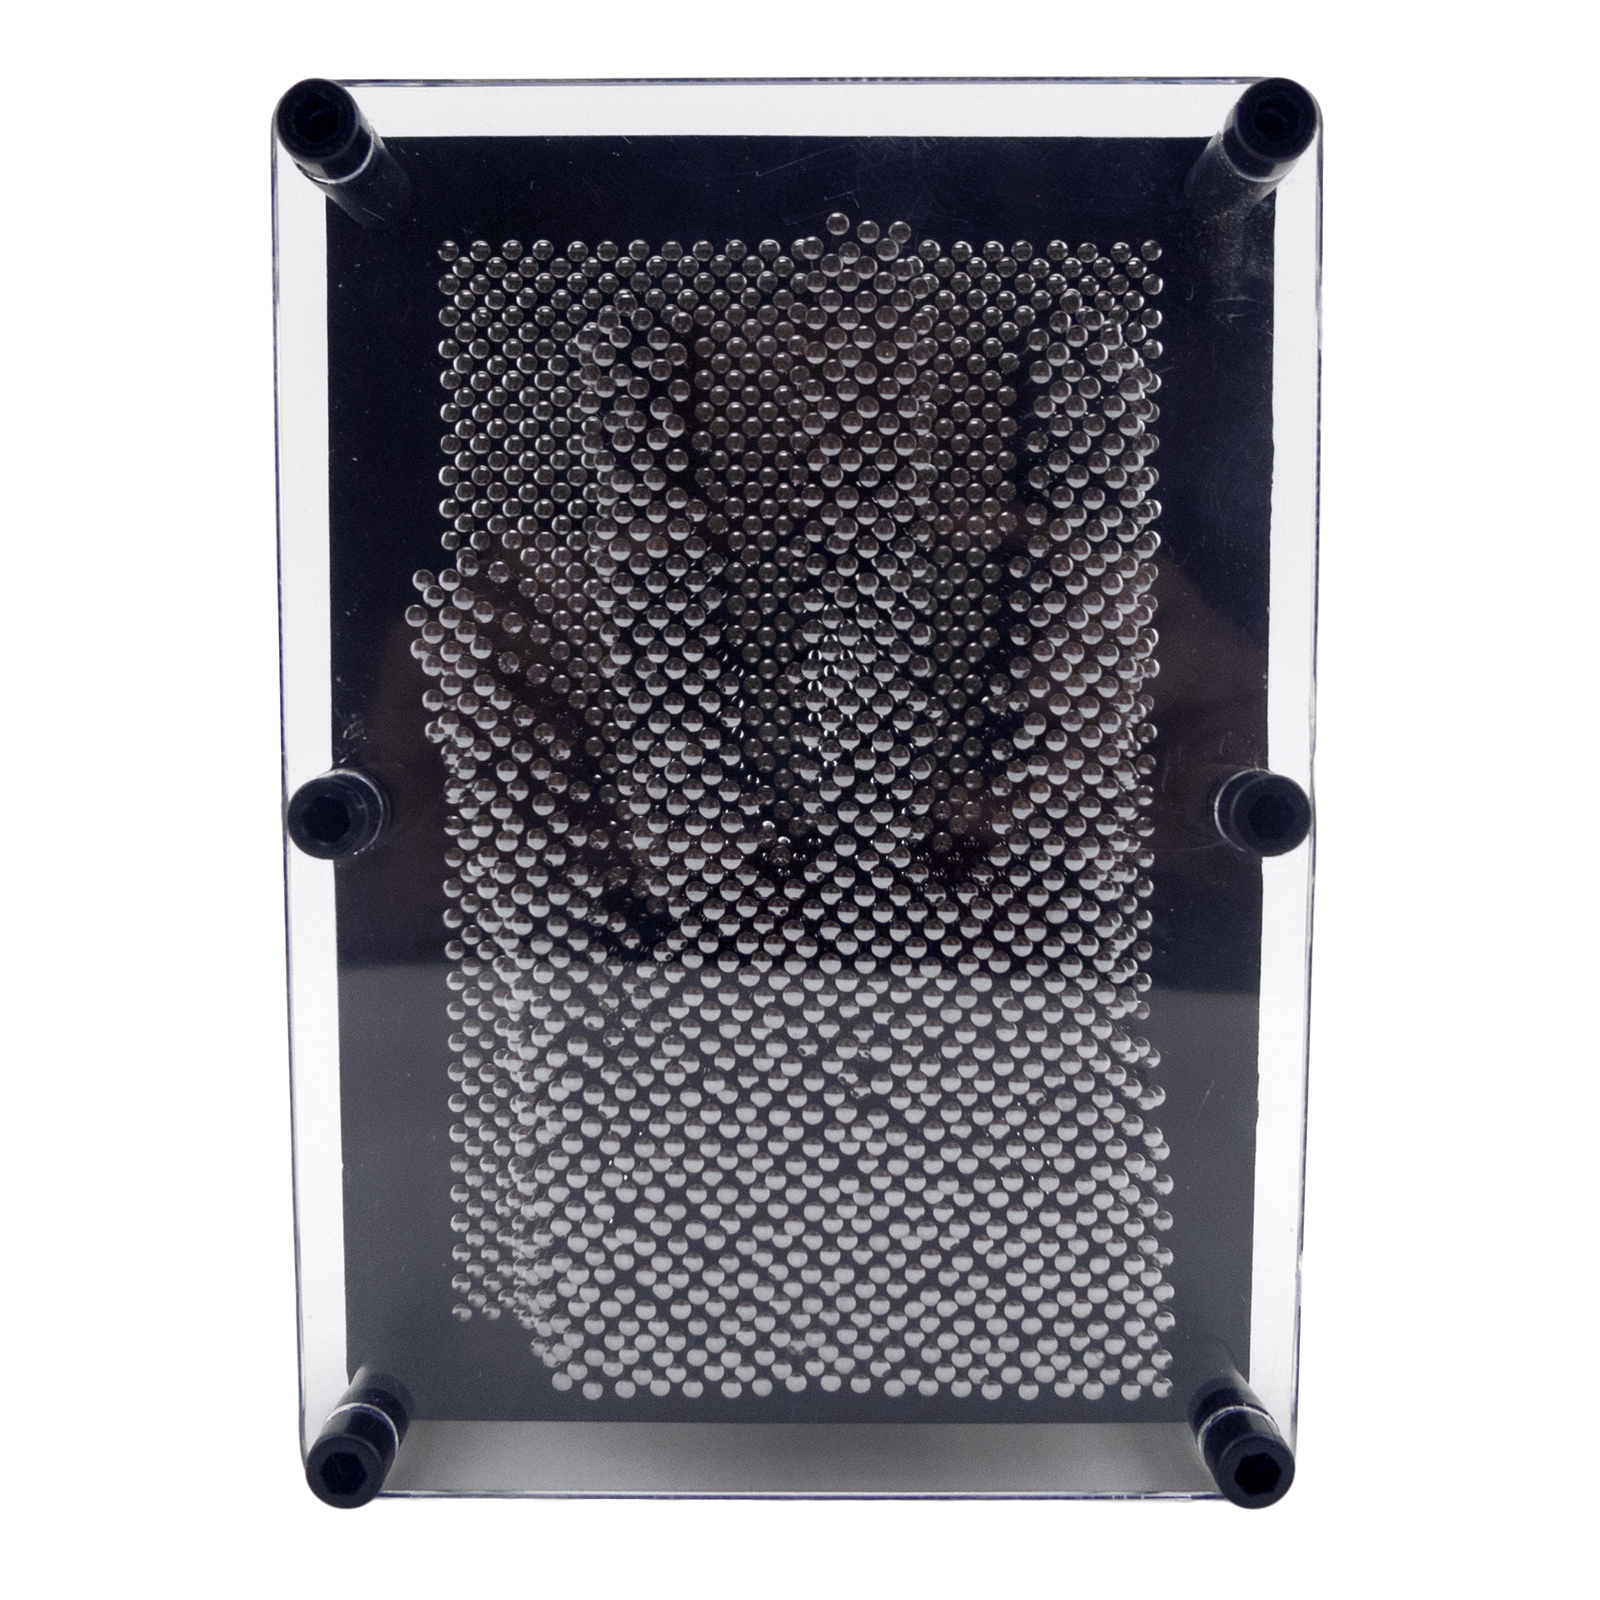 "Classic 3-D Metal Pin Art Toy Board Sculptures Silver Pins Impression 4/"" X 5/"""